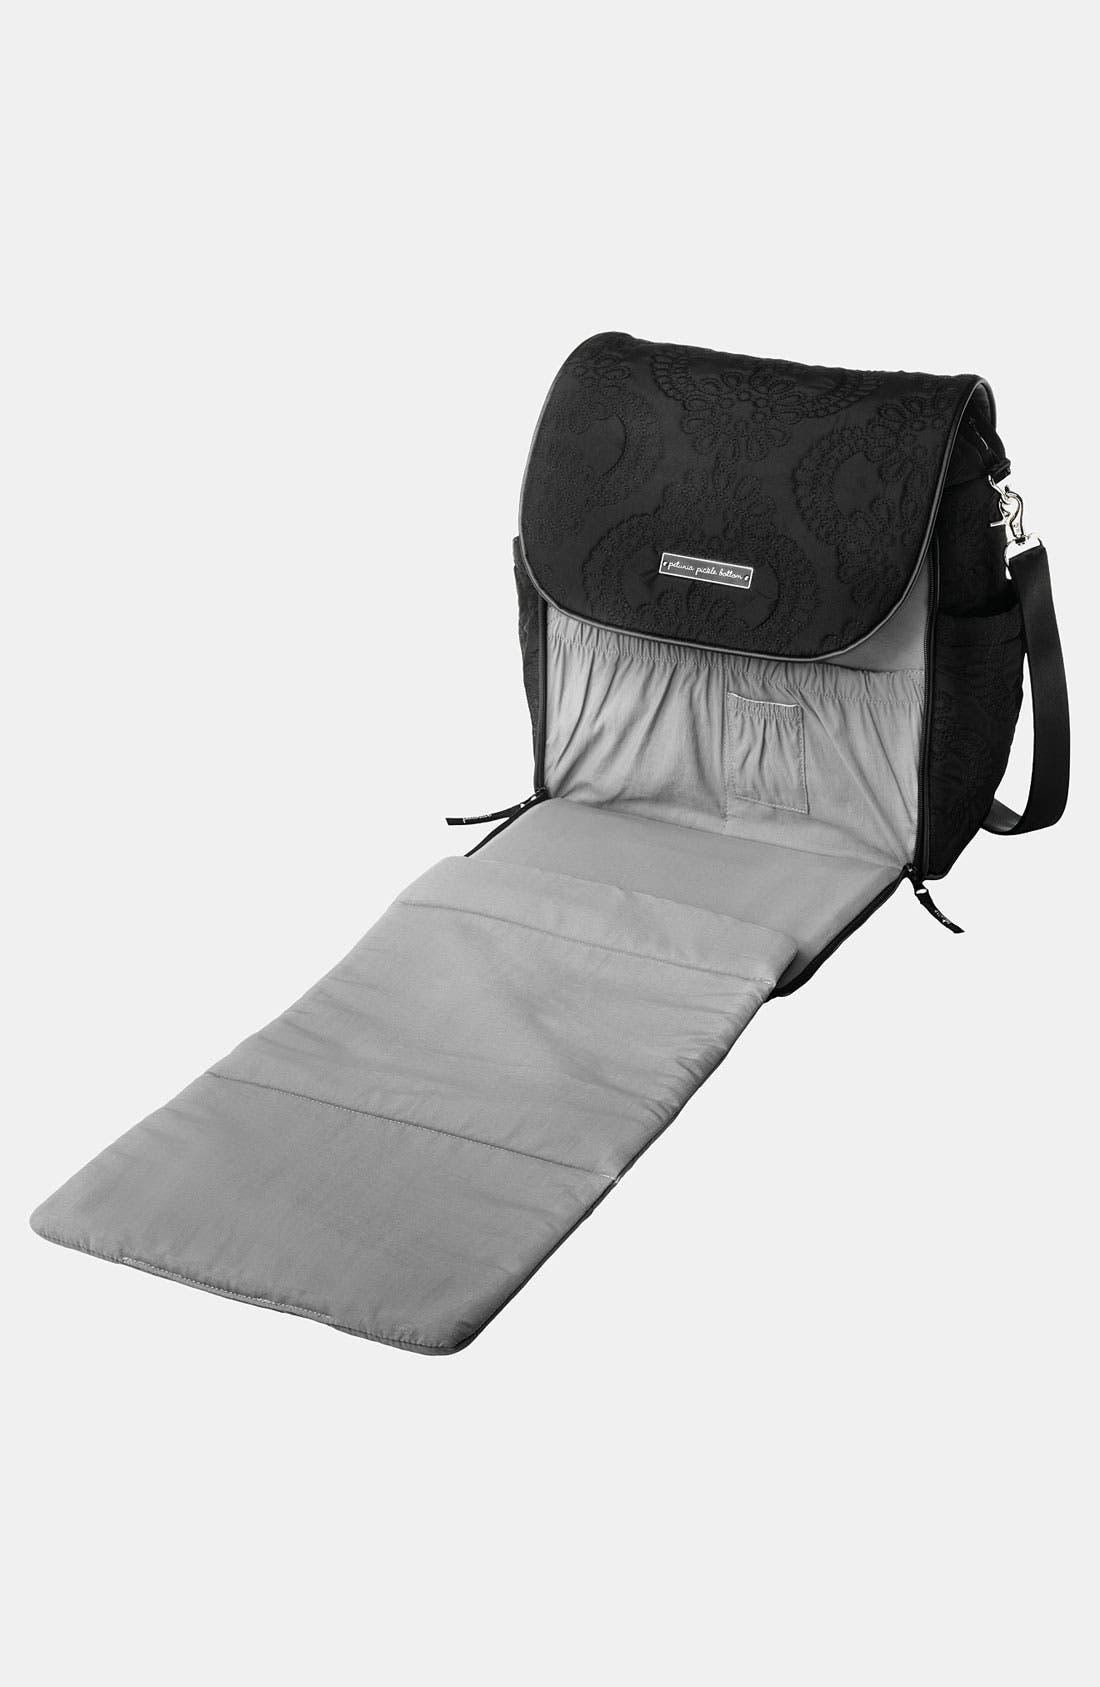 Alternate Image 3  - Petunia Pickle Bottom 'Embossed Boxy' Magnetic Closure Backpack Diaper Bag